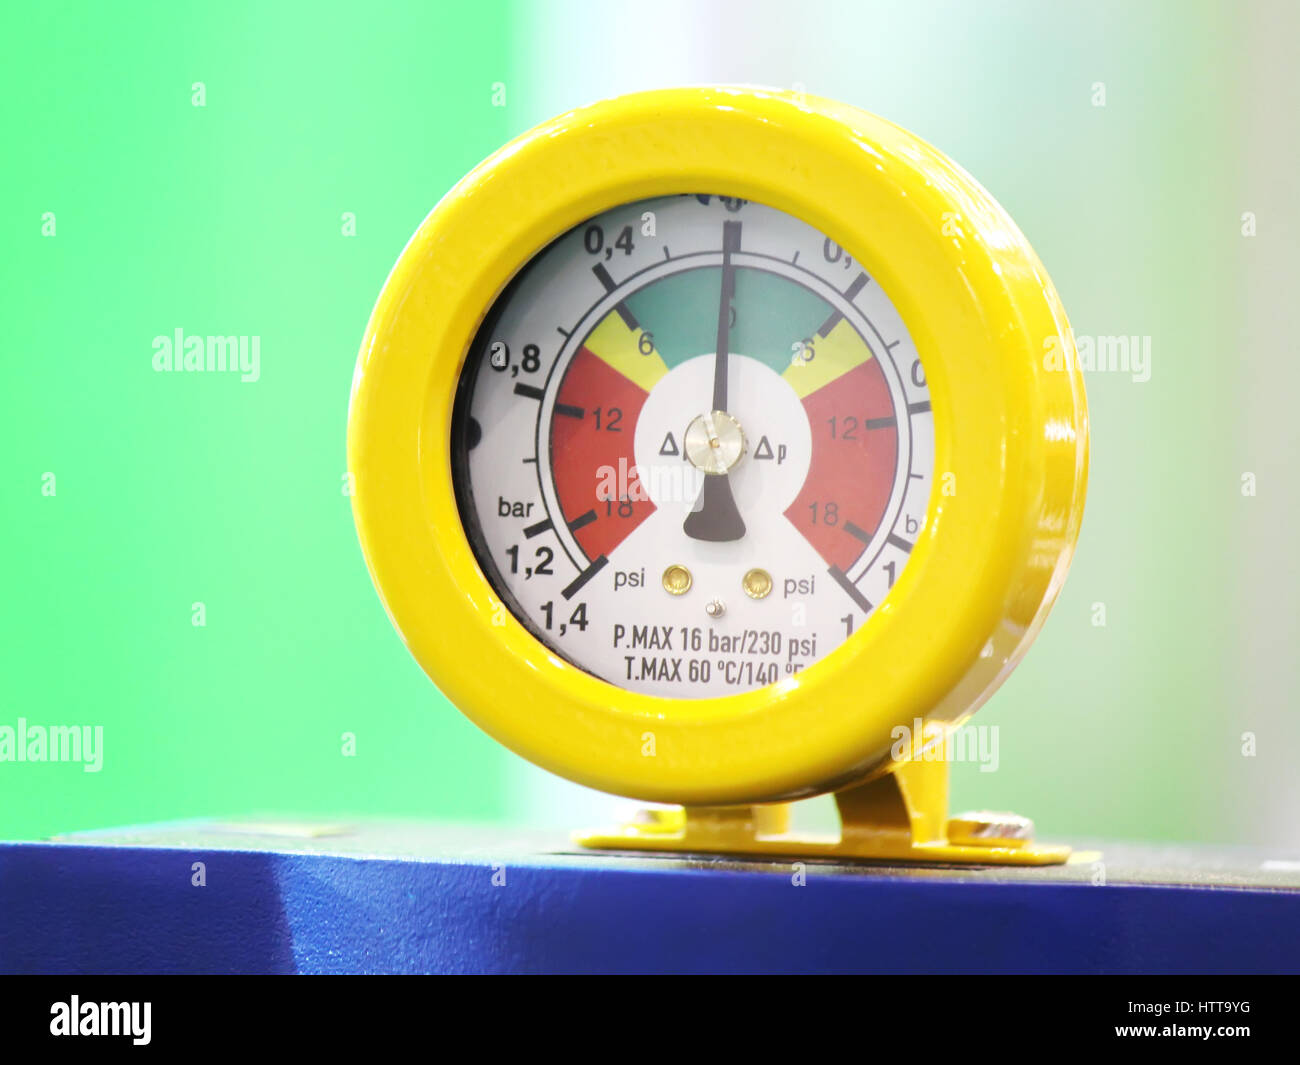 Pressure measuring instrument - Industrial Pressure Gauge - Stock Image